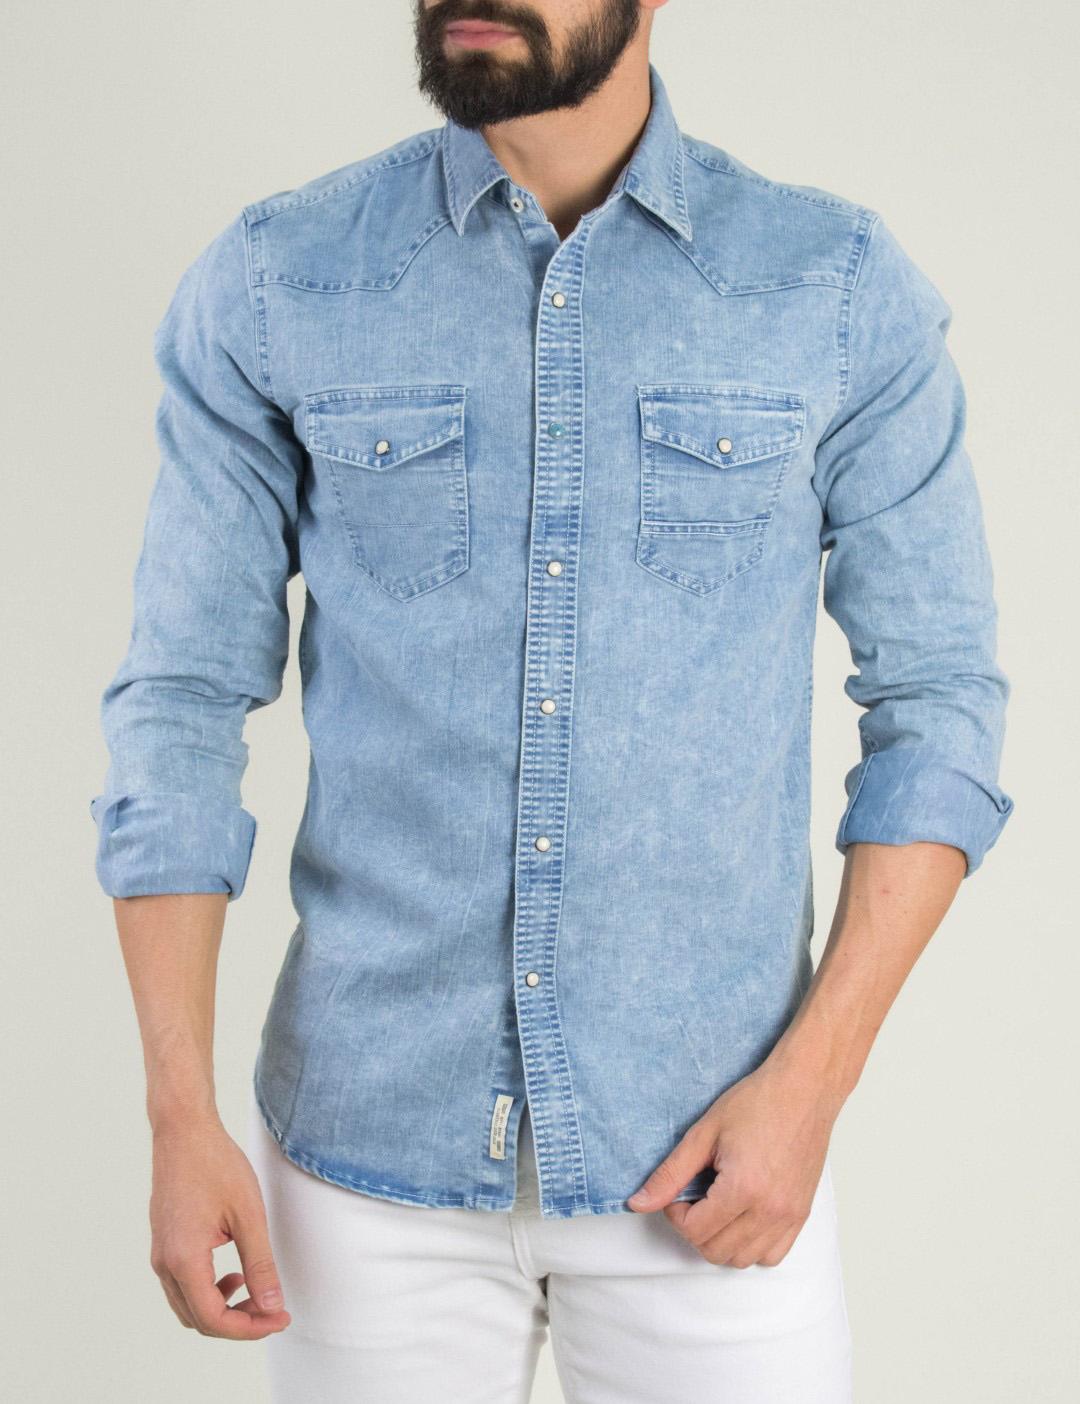 3a9def54fa29 Ανδρικό χλώριο τζιν πουκάμισο τσεπάκια 5510